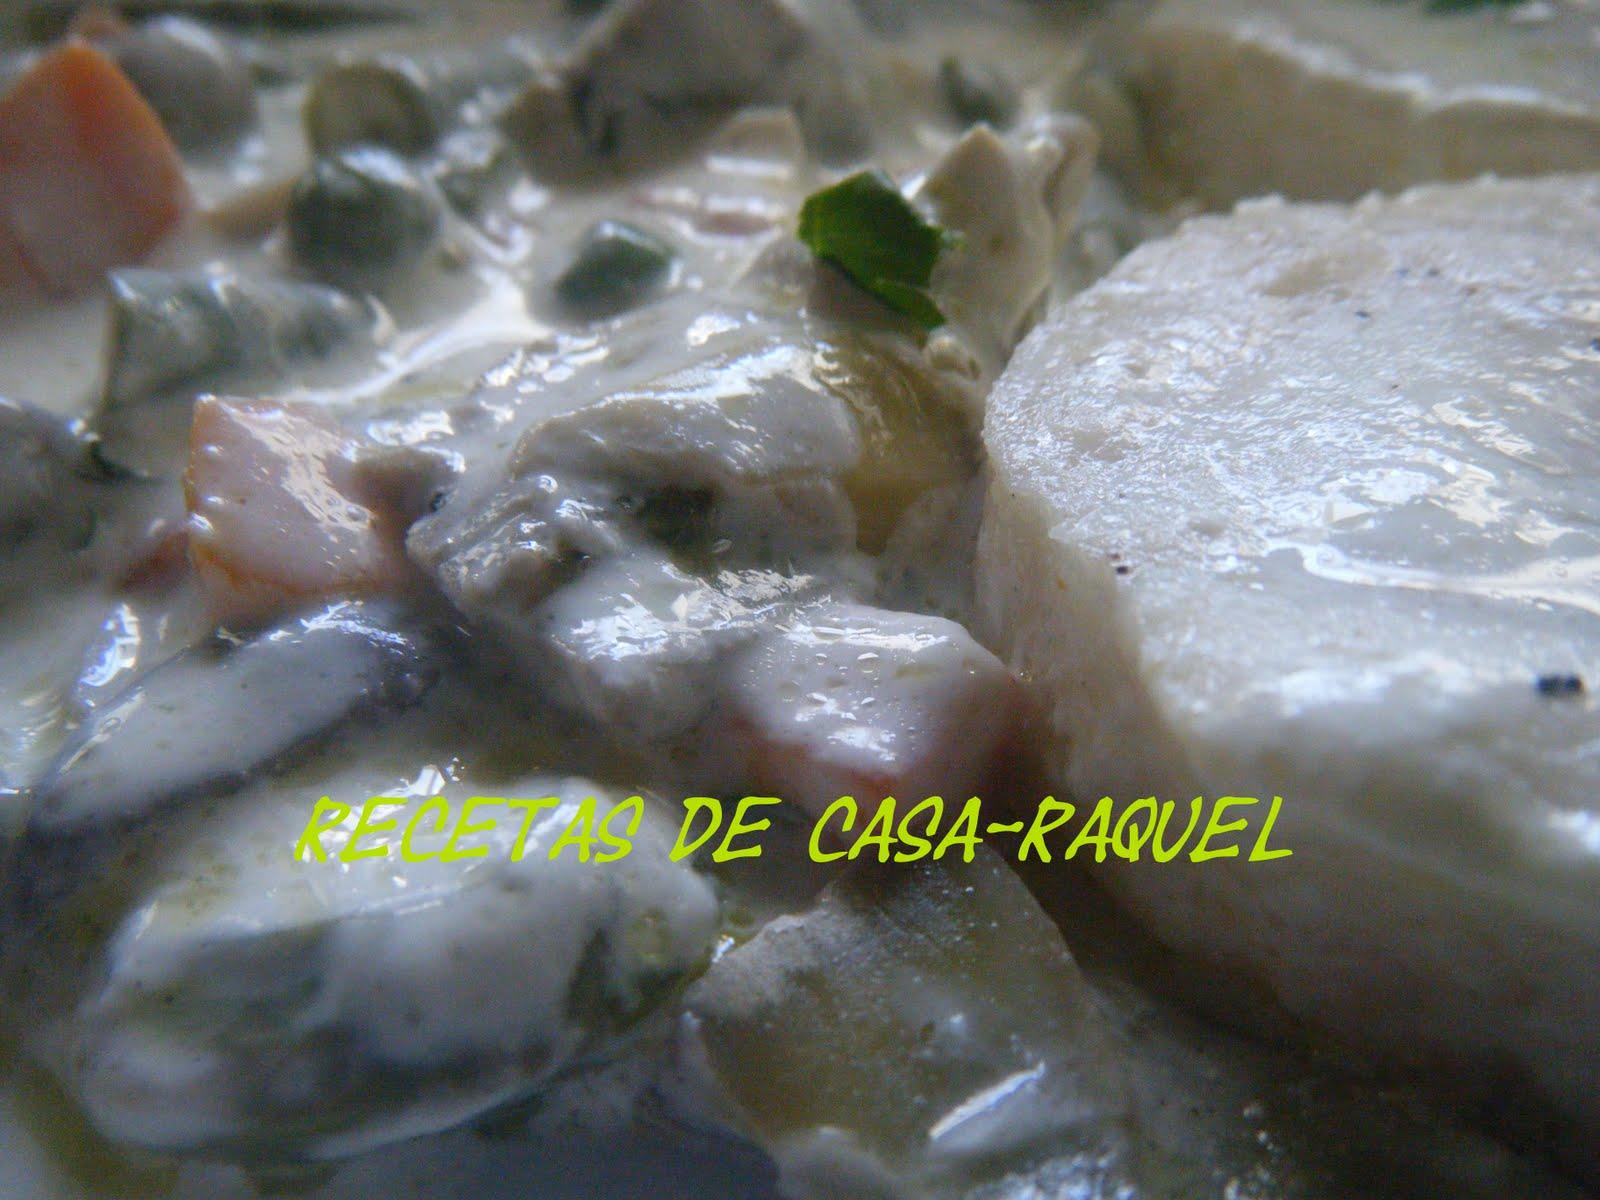 Recetas de casa raquel merluza con menestra microondas - Cocinar pescado en microondas ...